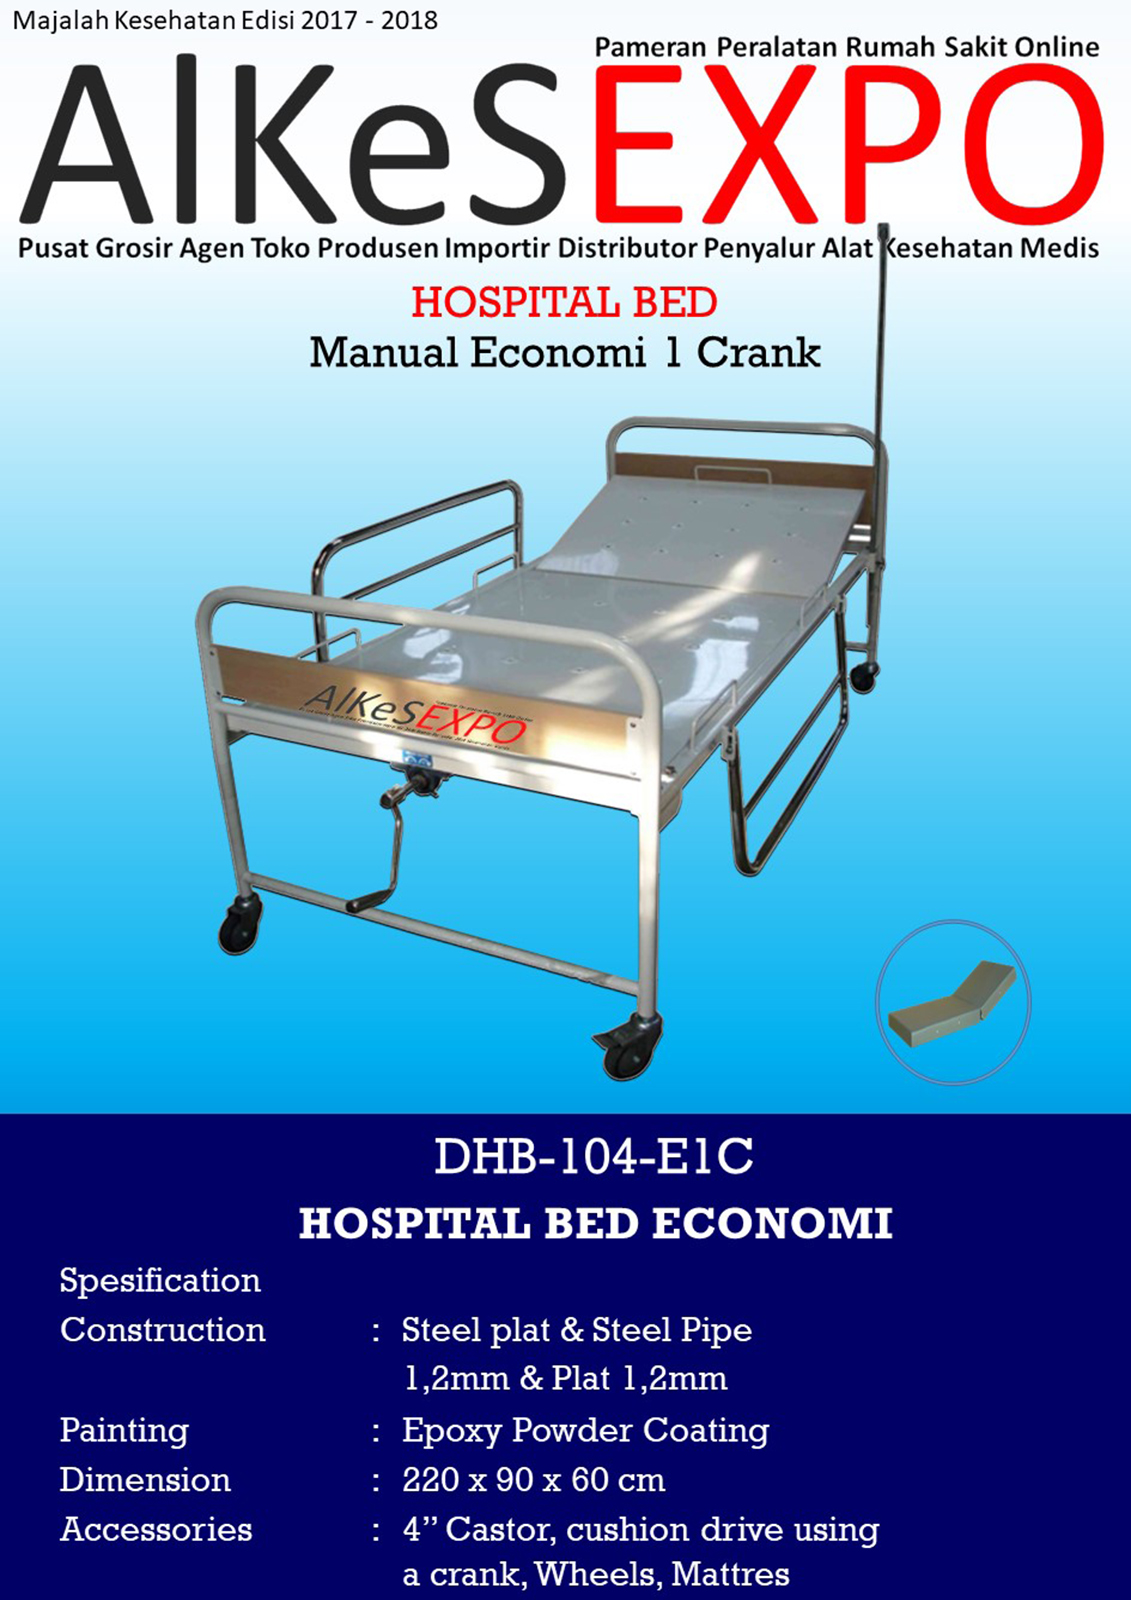 Hospital Bed Economi 1 Crank DHB-104-E1C